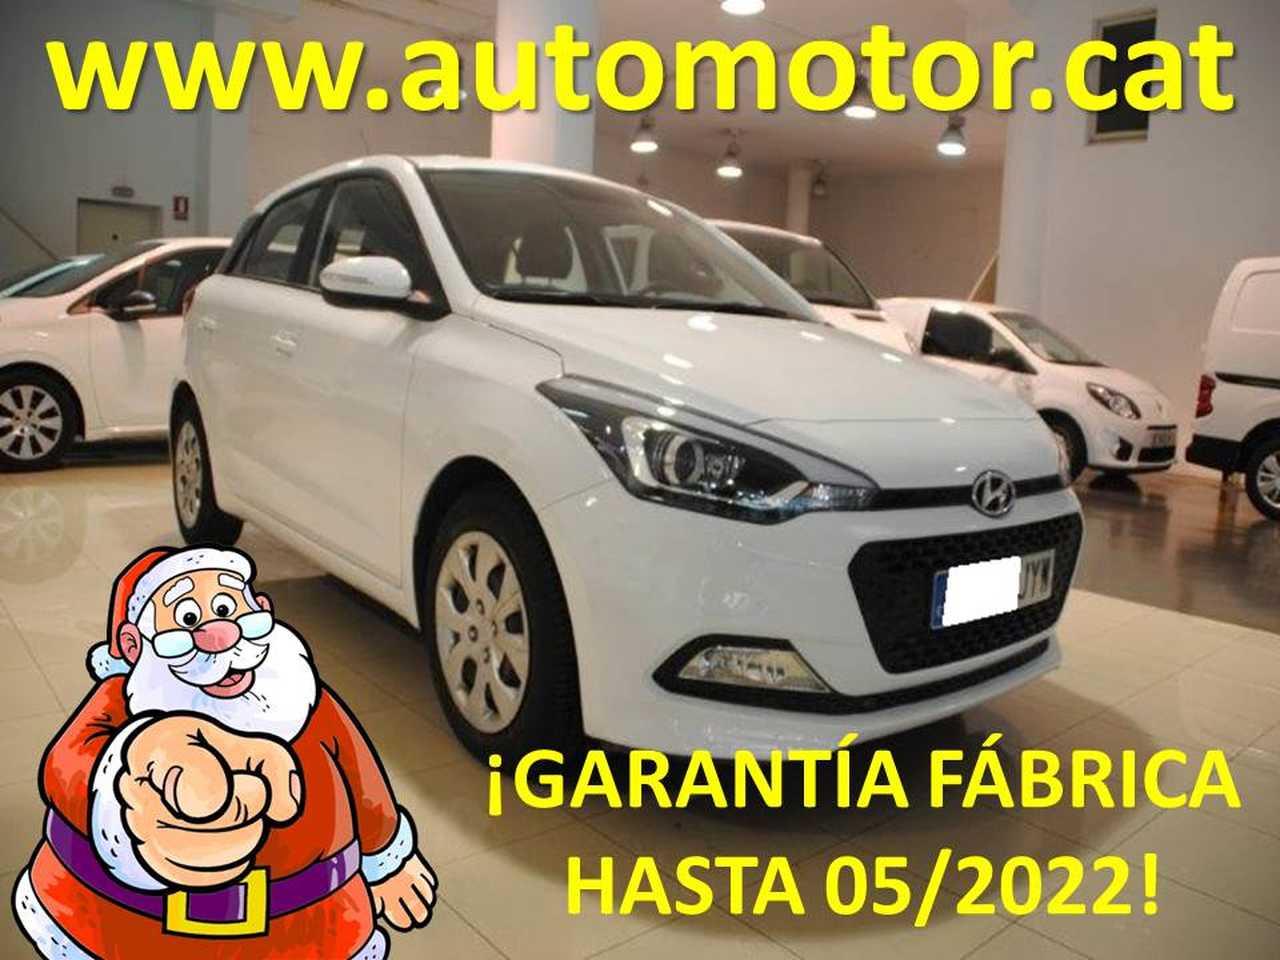 Hyundai i20 1.4CRDI Klass  - GARANTIA FABRICA HASTA 05/2022  - Foto 1